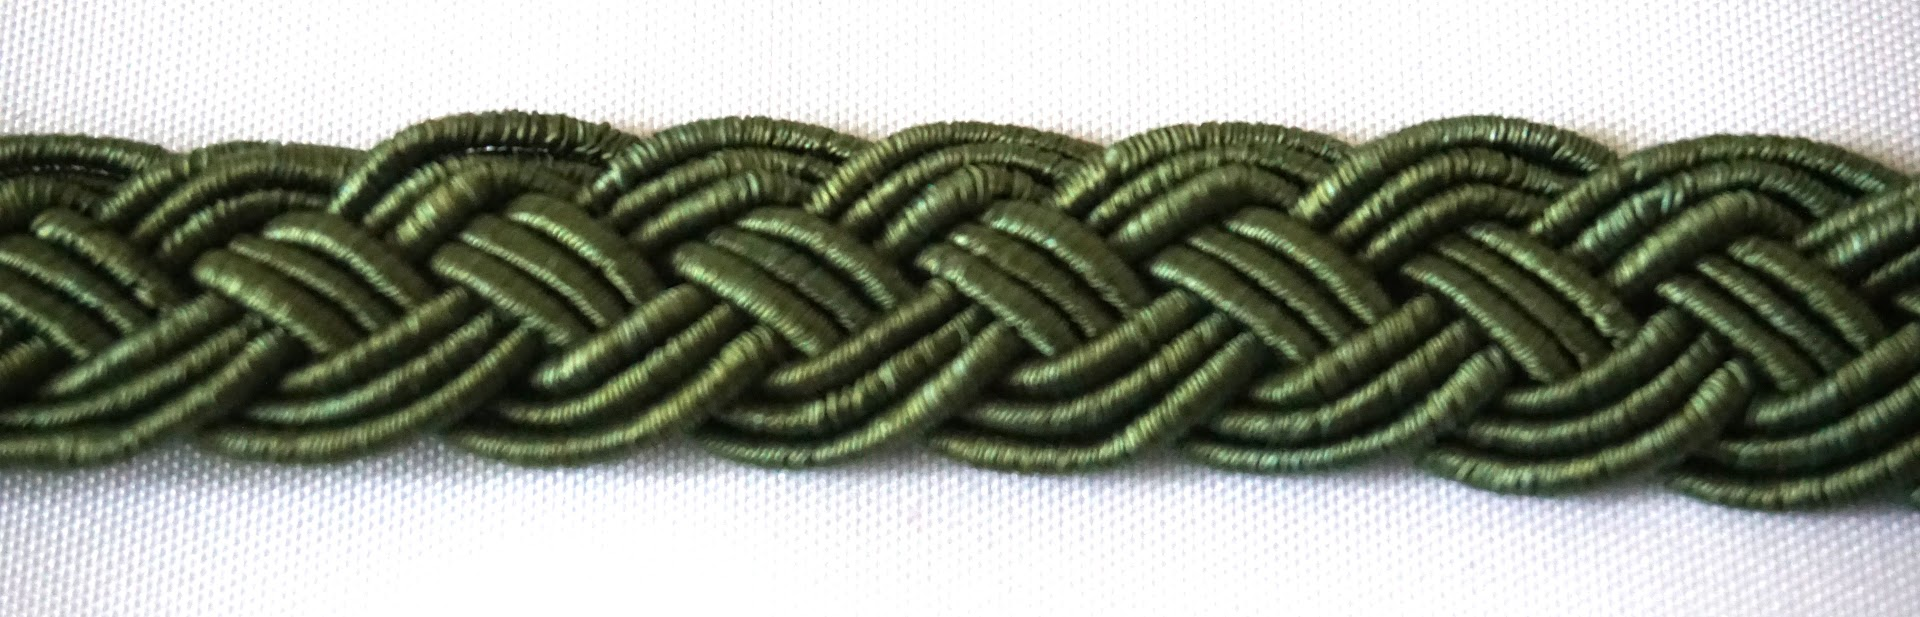 Pletenice za šapke. Made by SZR Mali Globus